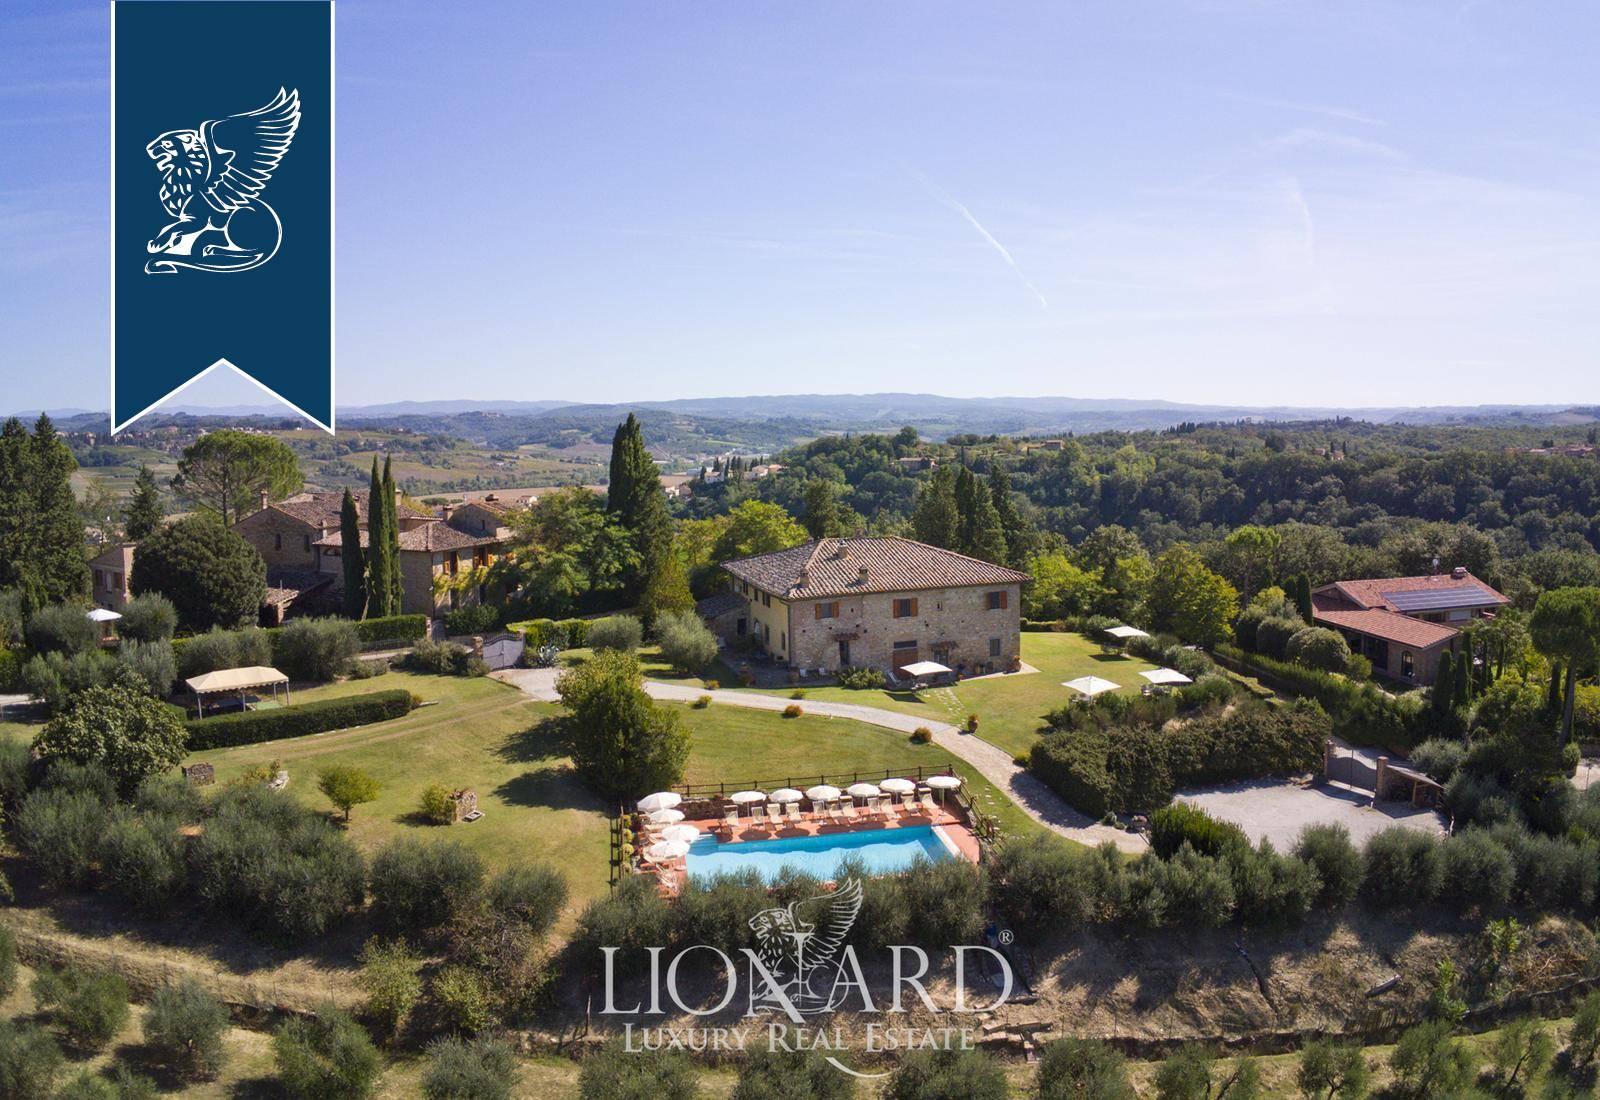 Agriturismo in Vendita a San Gimignano: 0 locali, 900 mq - Foto 6